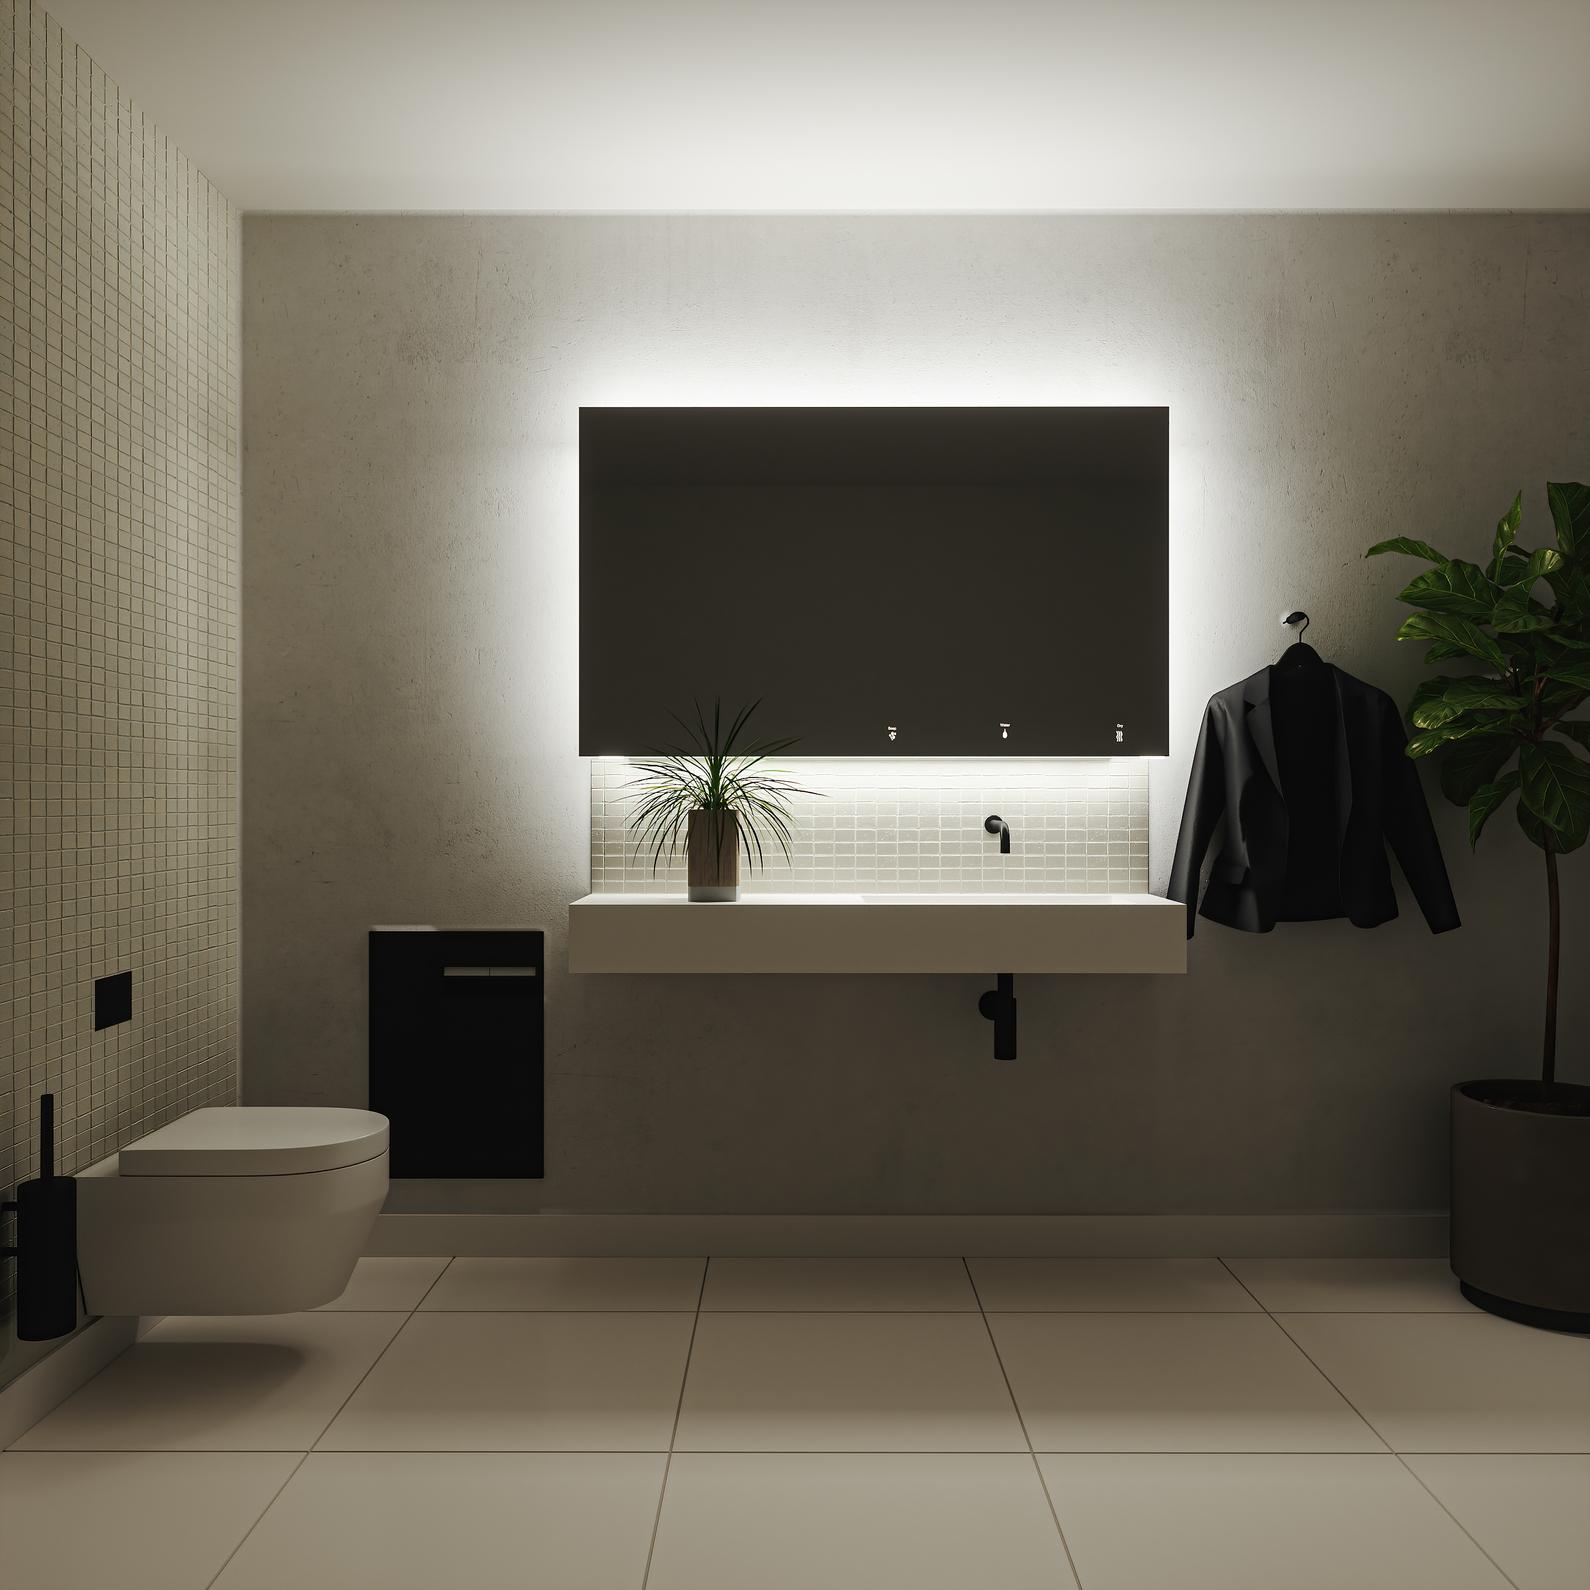 superloo-set-with-behind-mirror